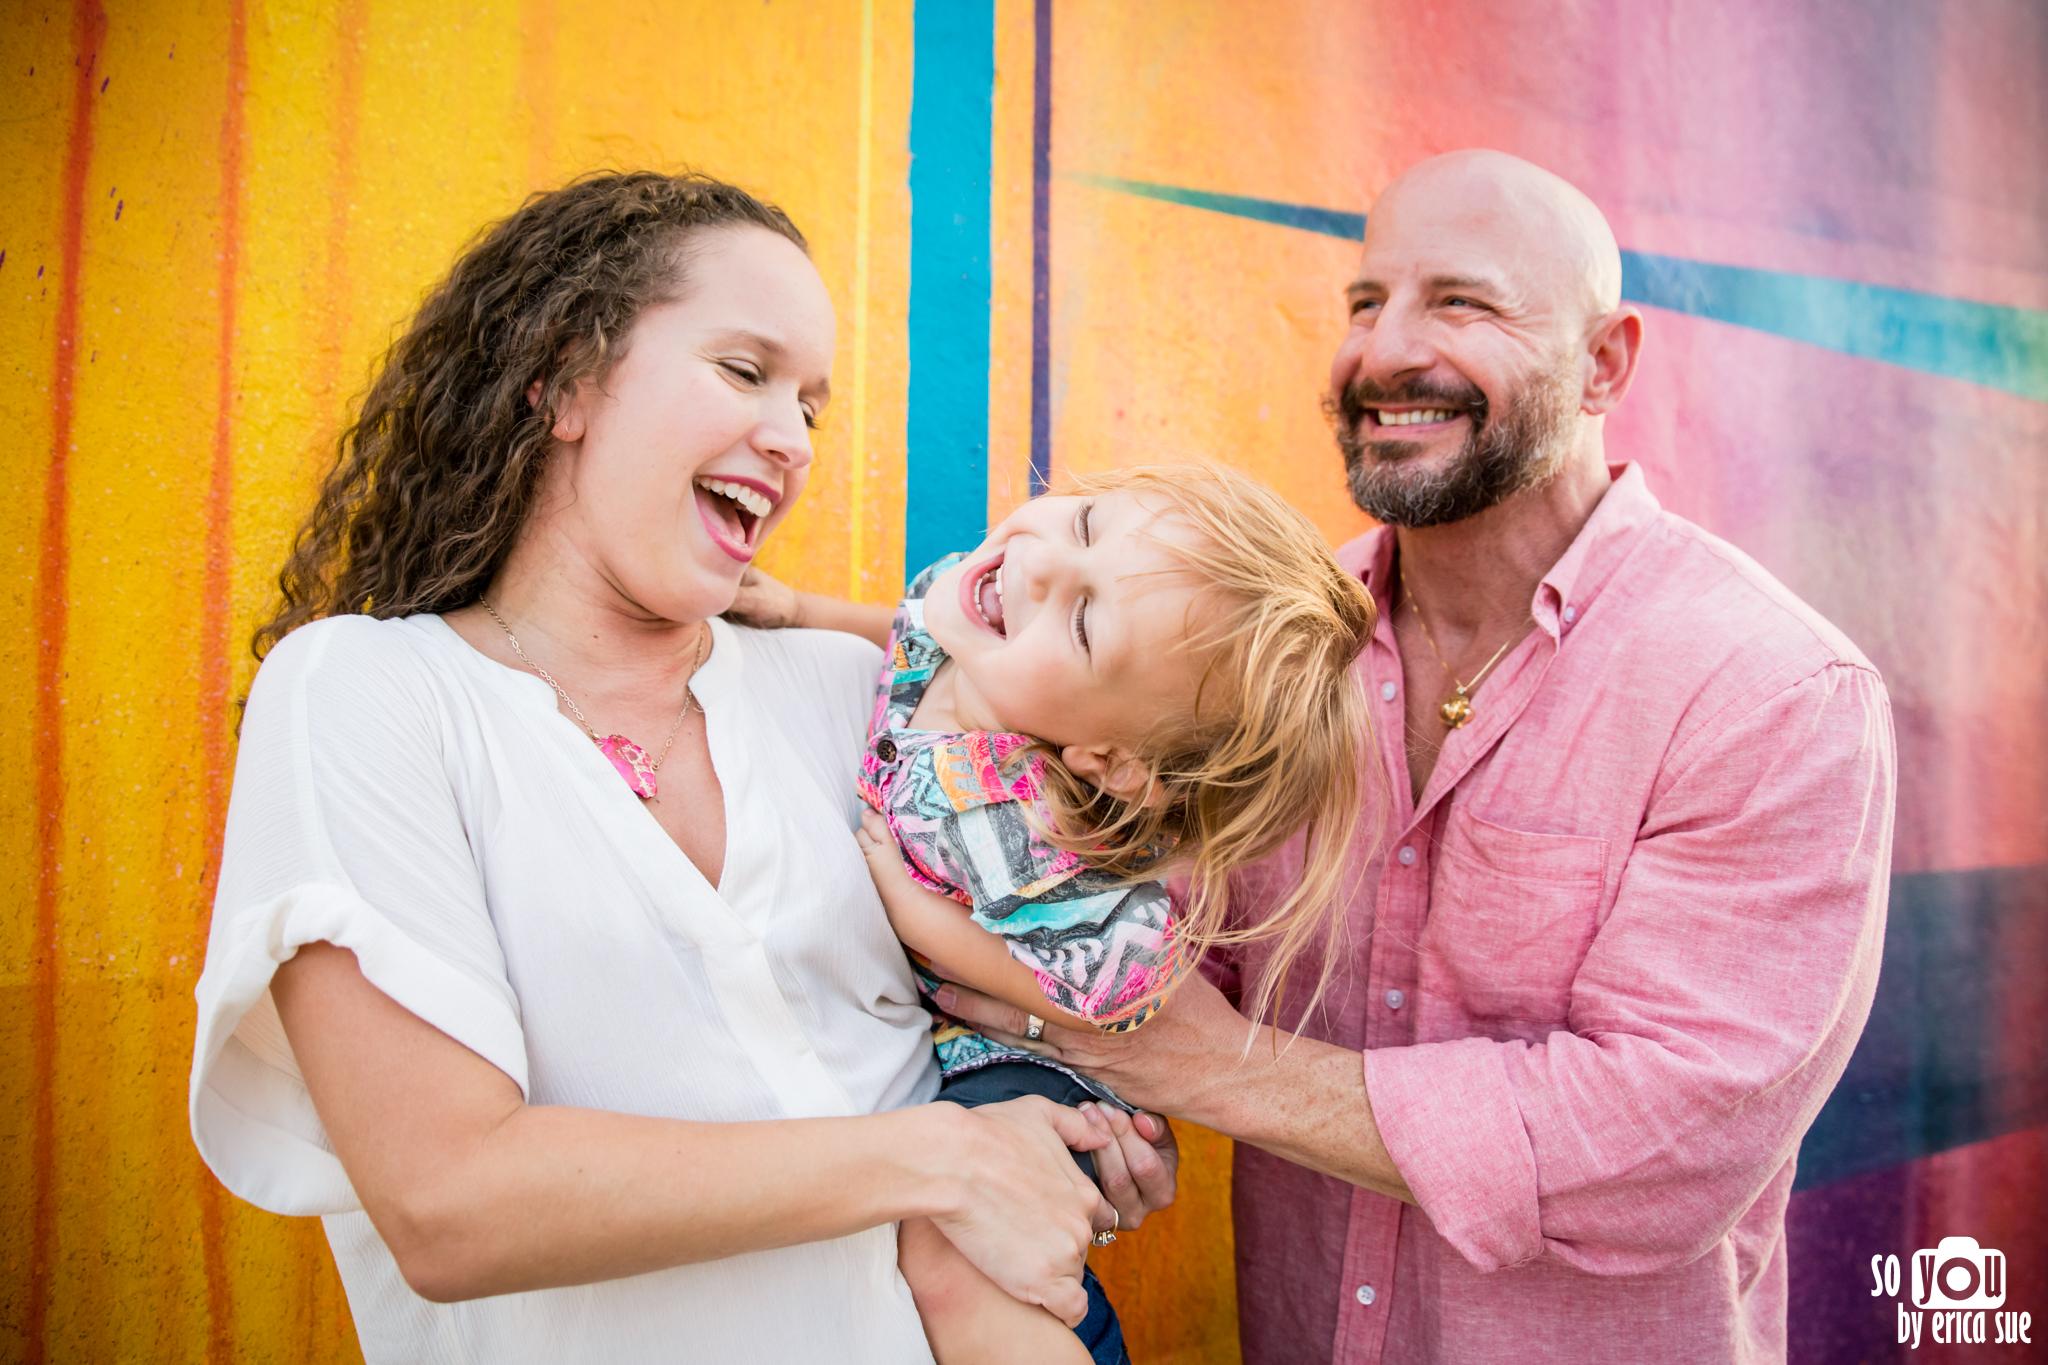 so-you-by-erica-wynwood-photo-shoot-family-photography-miami-7676.jpg